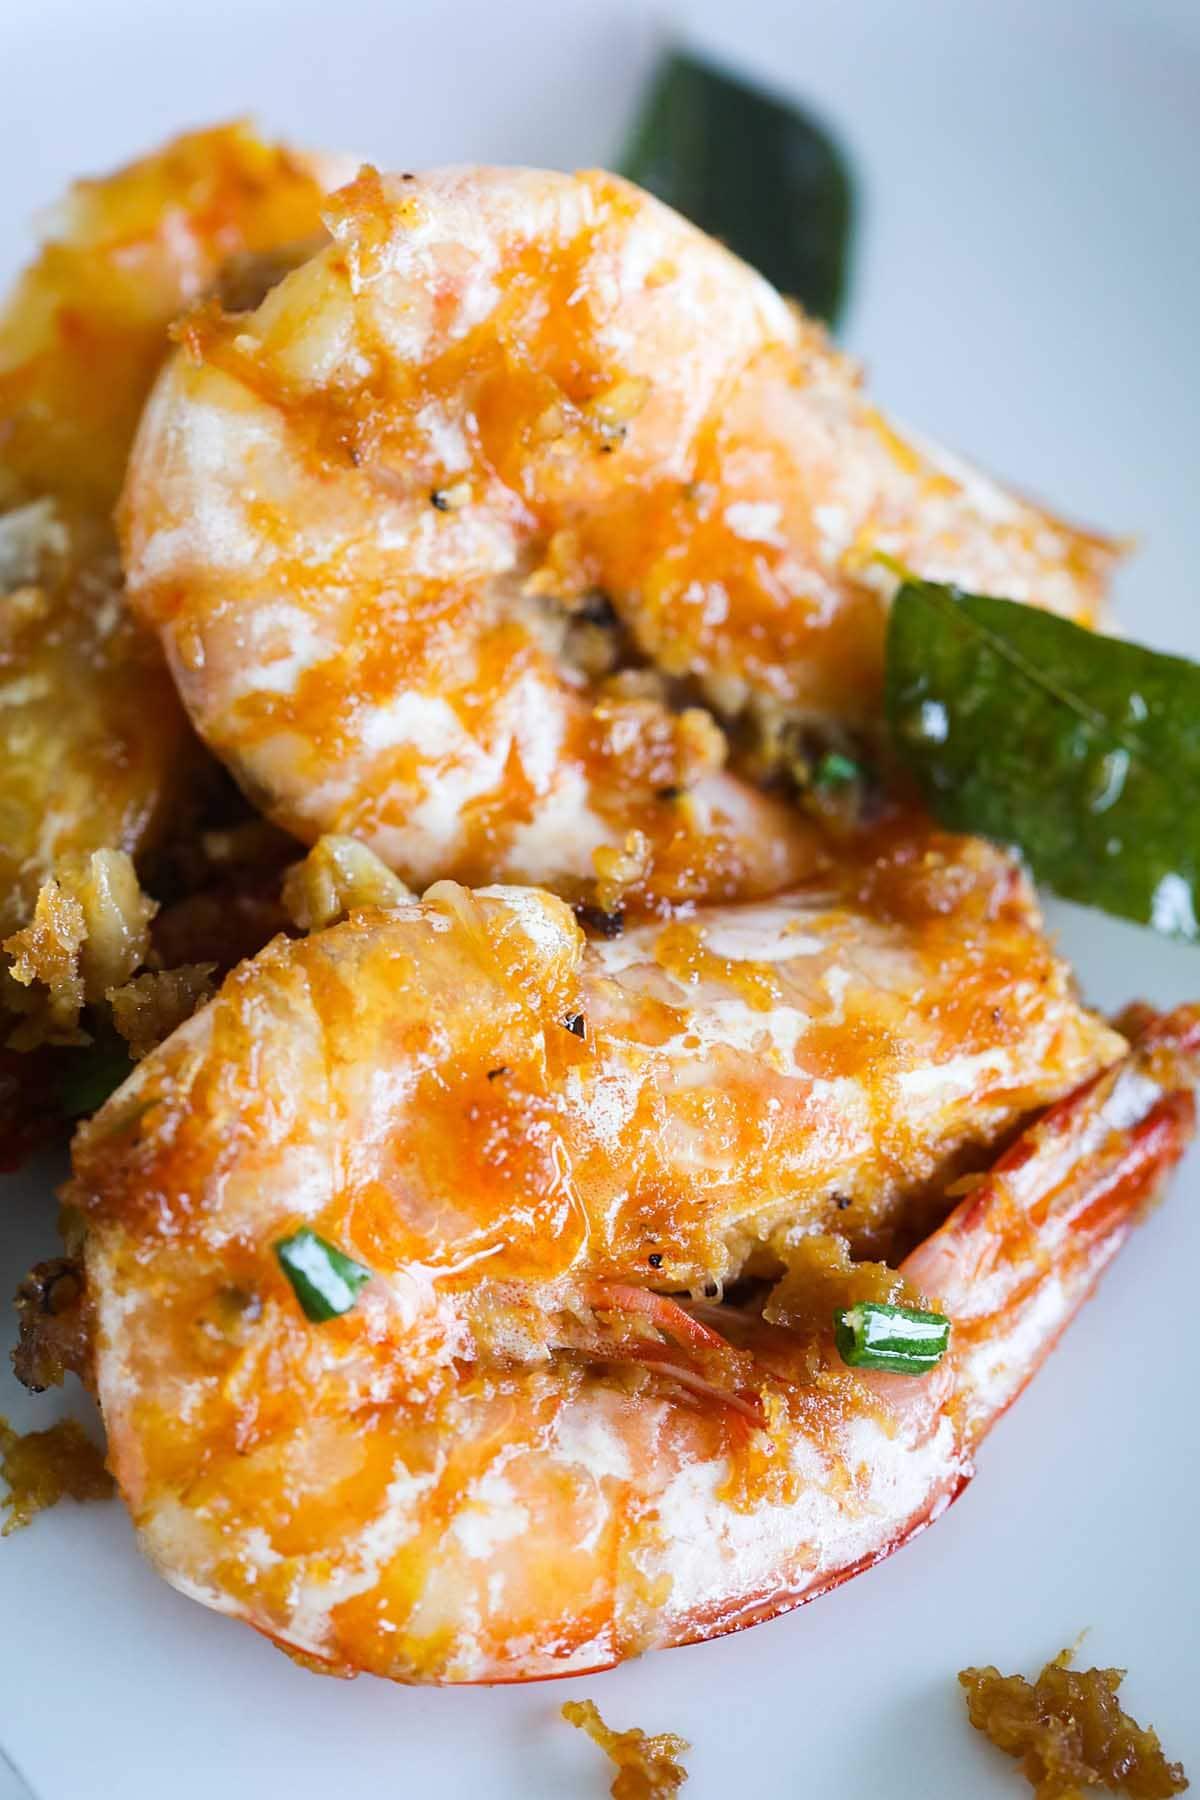 Butter prawn, ready to serve.